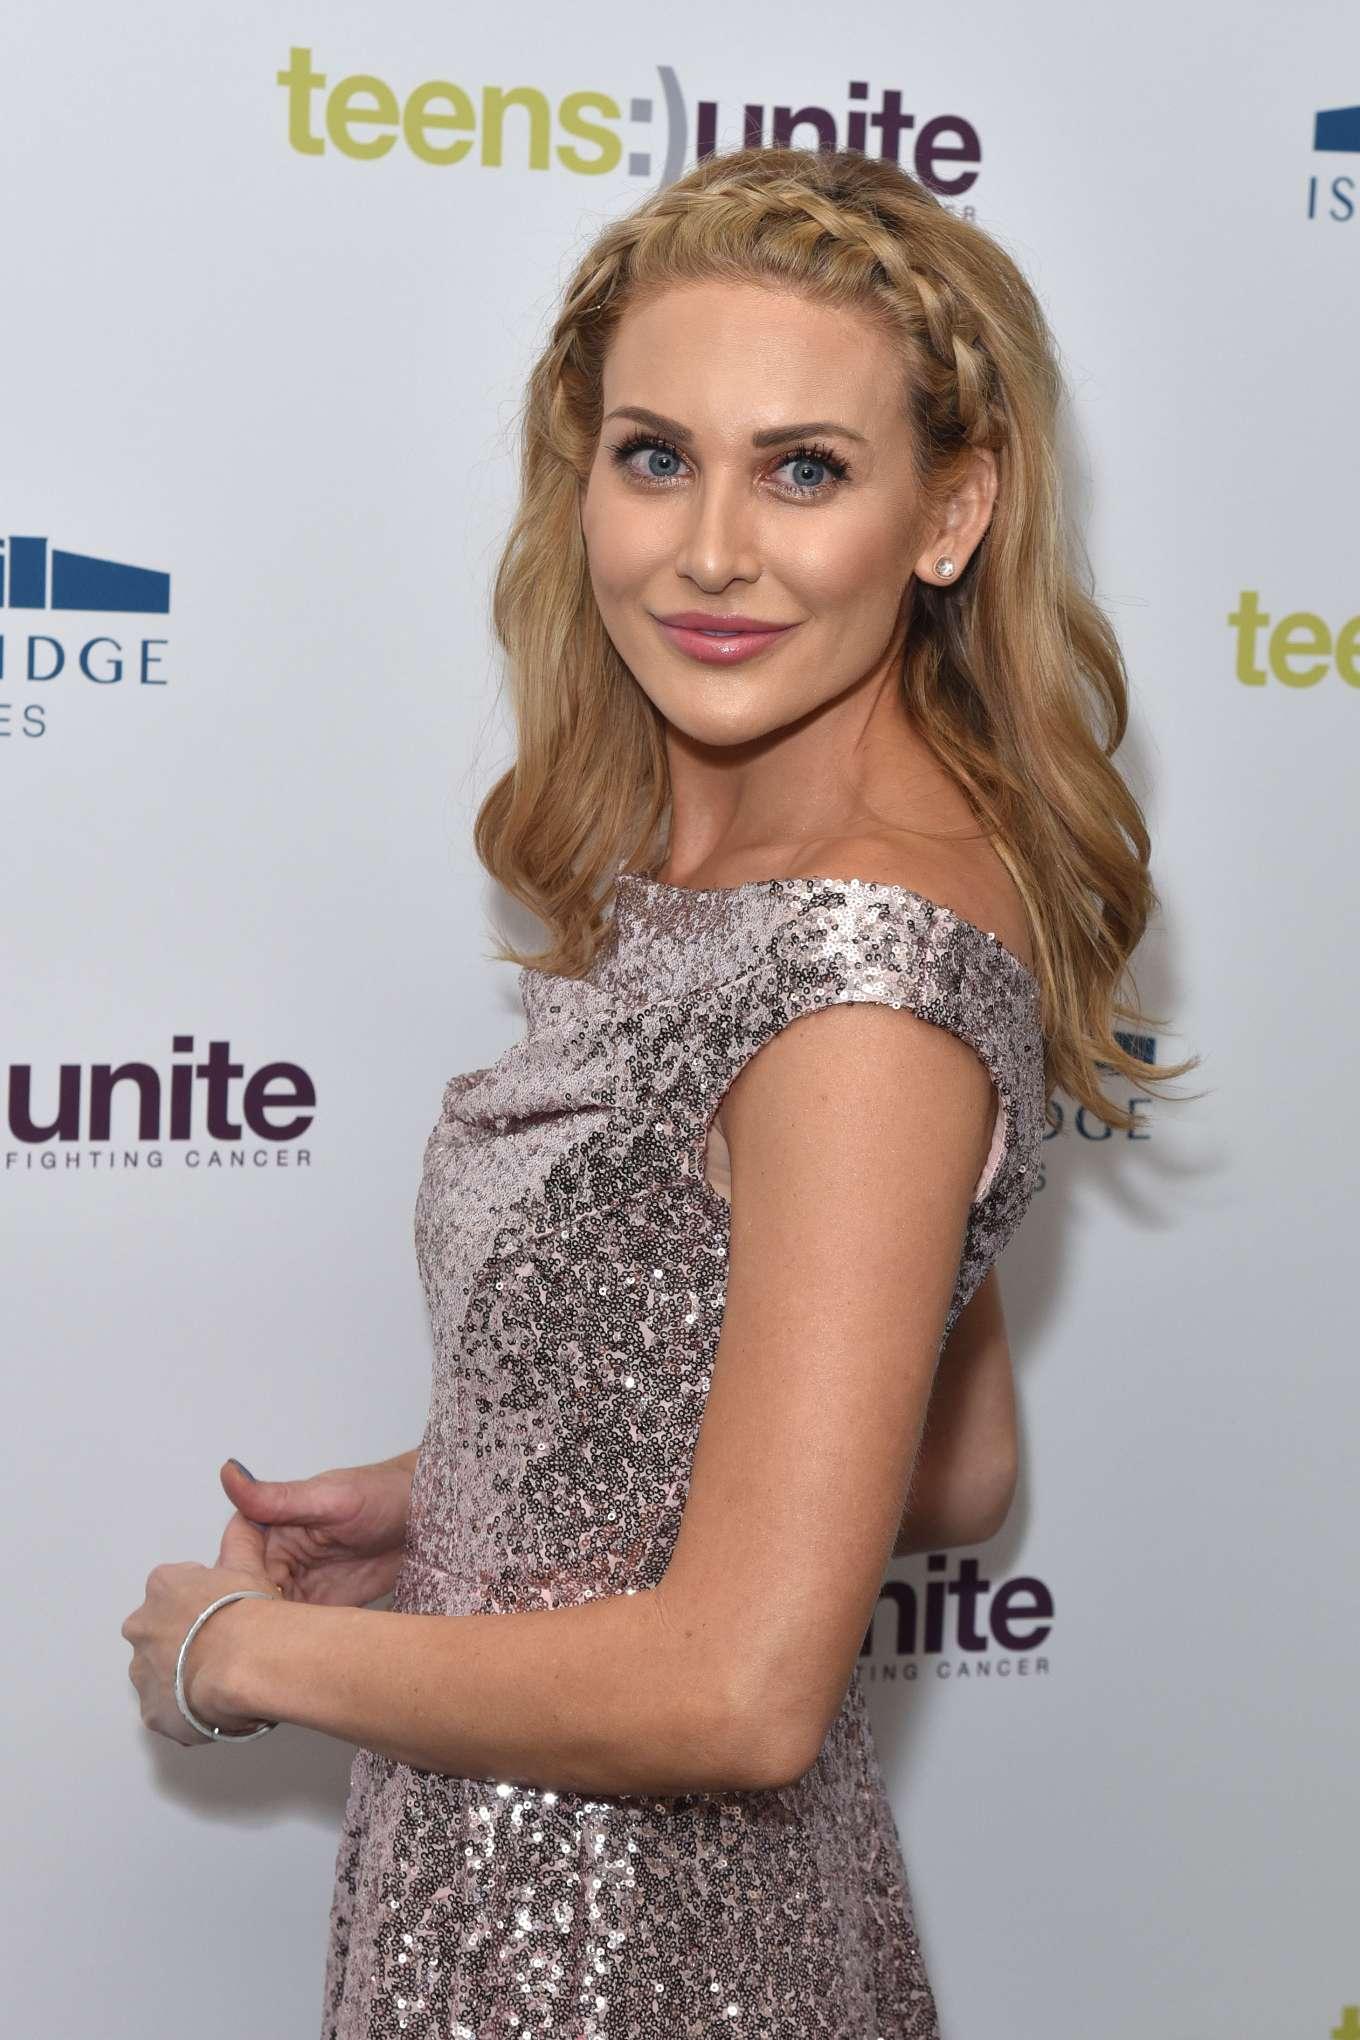 Stephanie Pratt 2019 : Stephanie Pratt – Teens Unite Annual Fundraising Gala-02